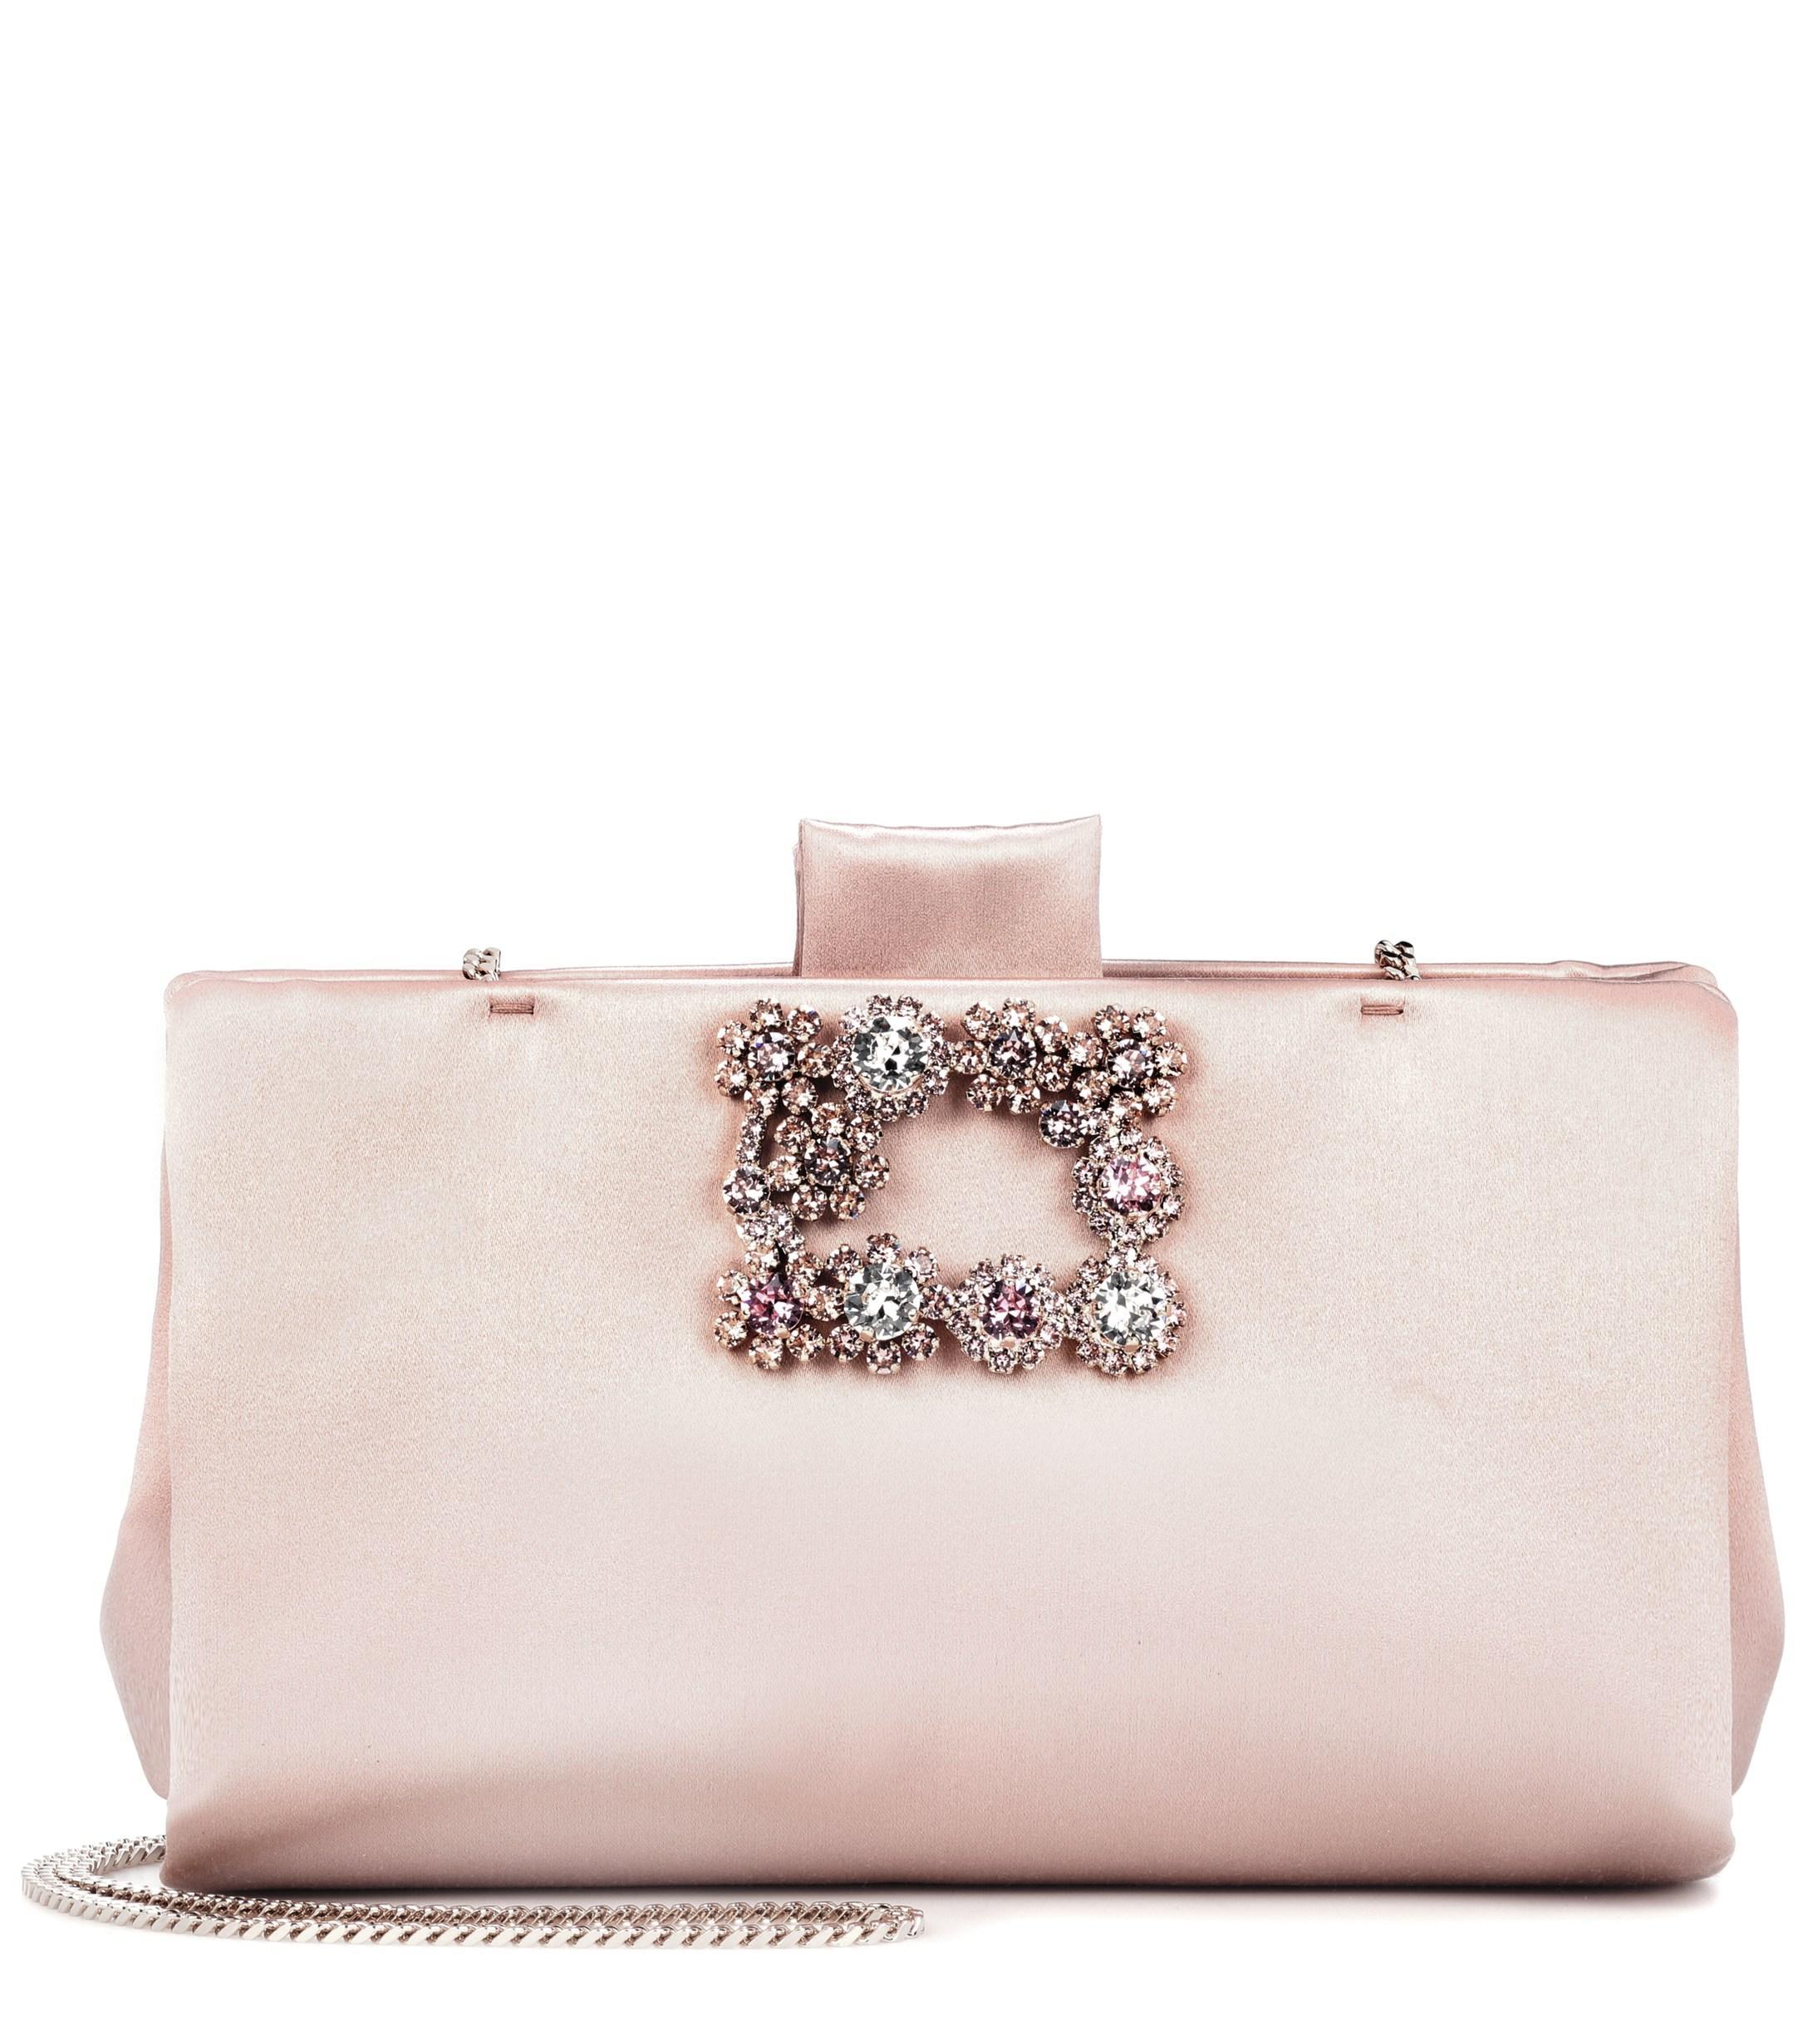 699c21b90529 Lyst - Roger Vivier Soft Flowers Satin Clutch in Pink